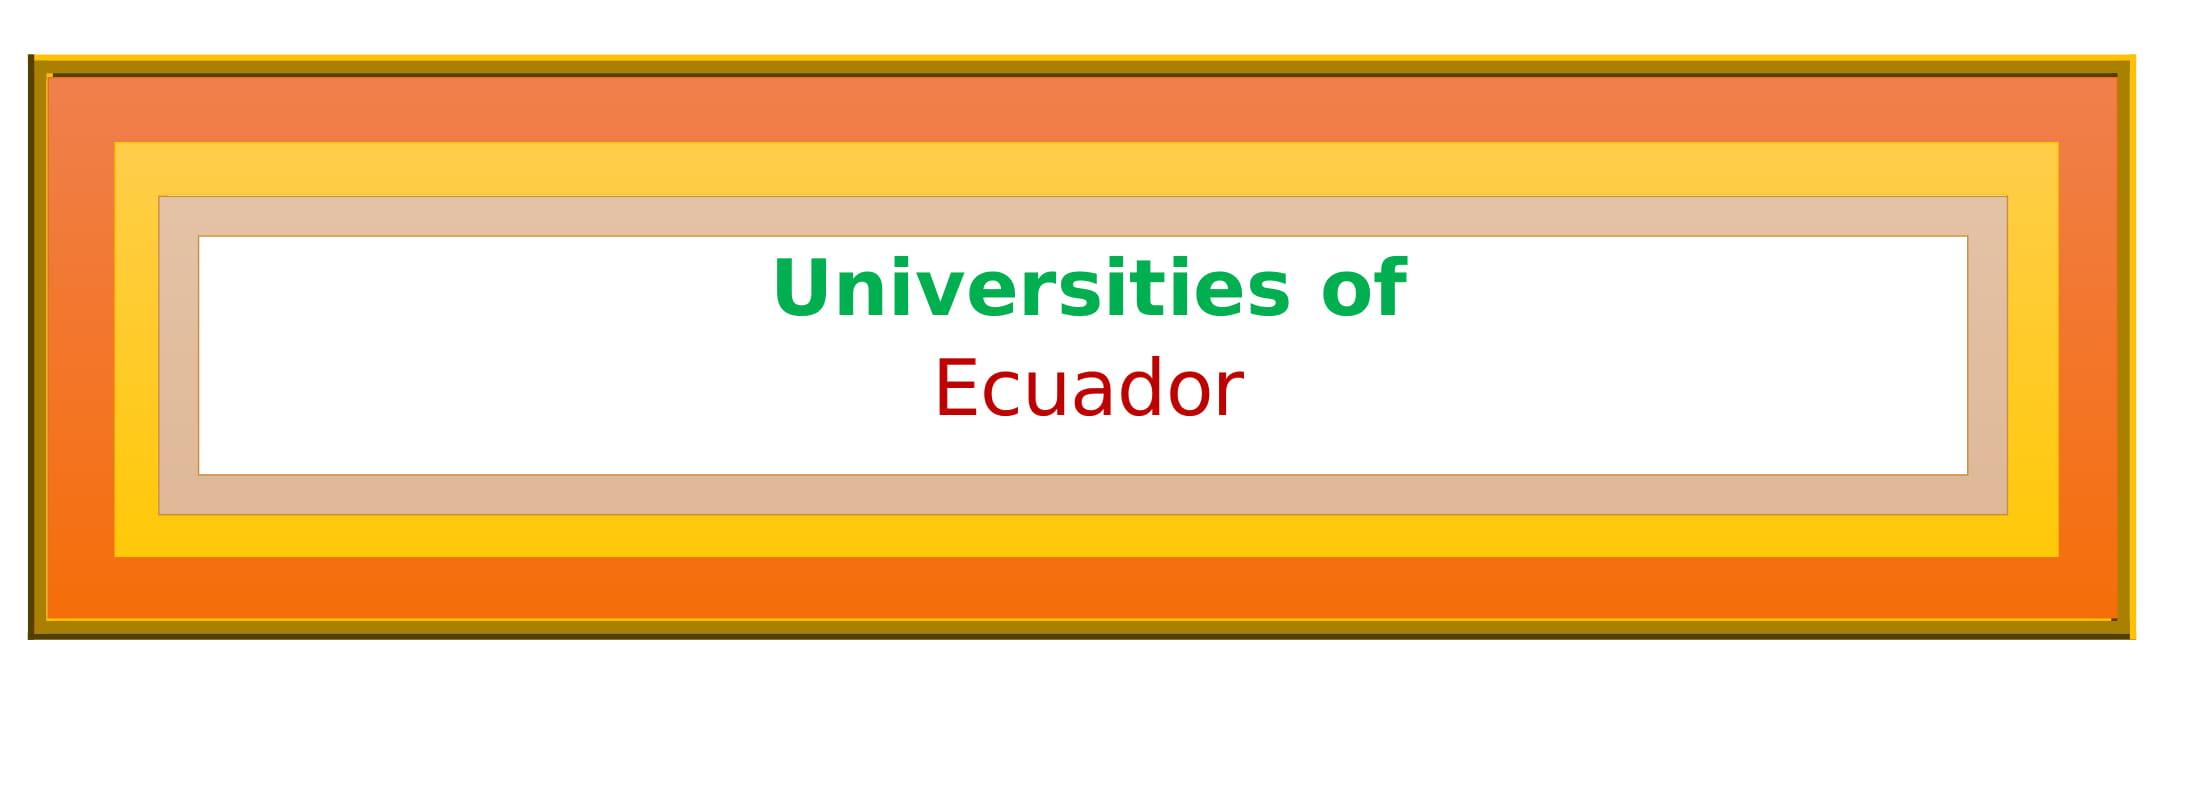 List of Universities in Ecuador